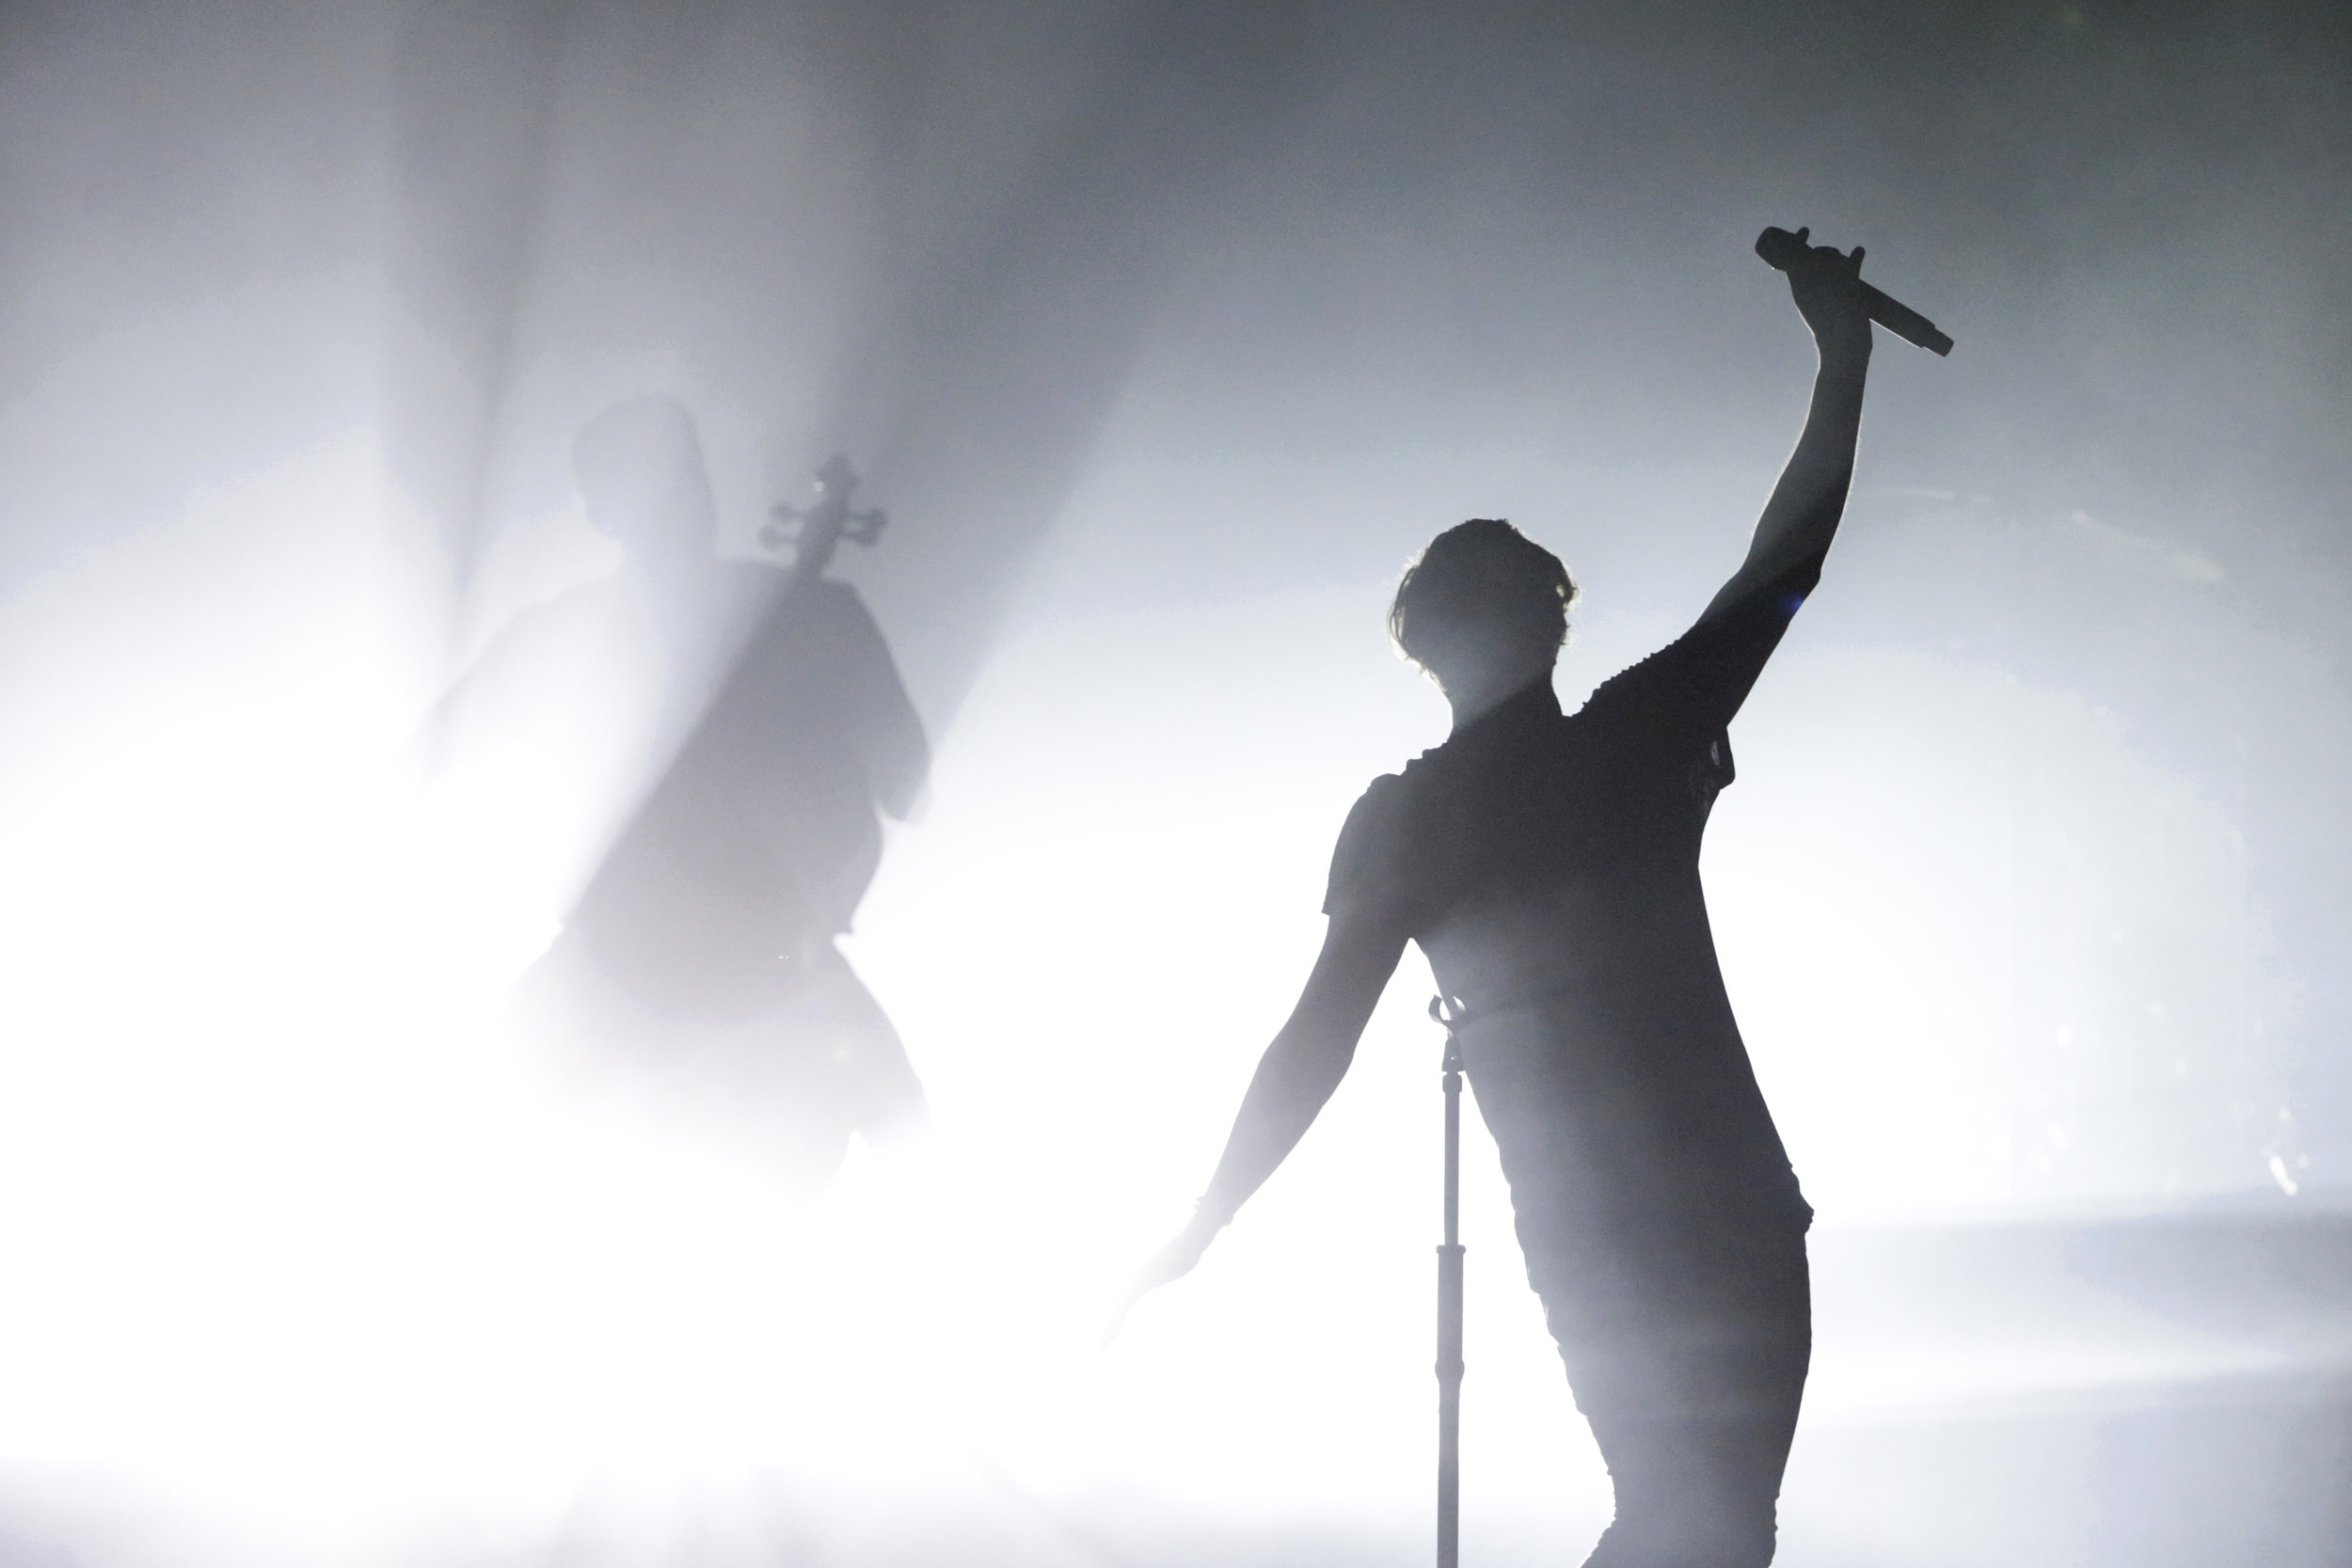 Ryan Tedder, lead singer of OneRepublic, performs at Klipsch Music Center on Thursday, July 13, 2017.